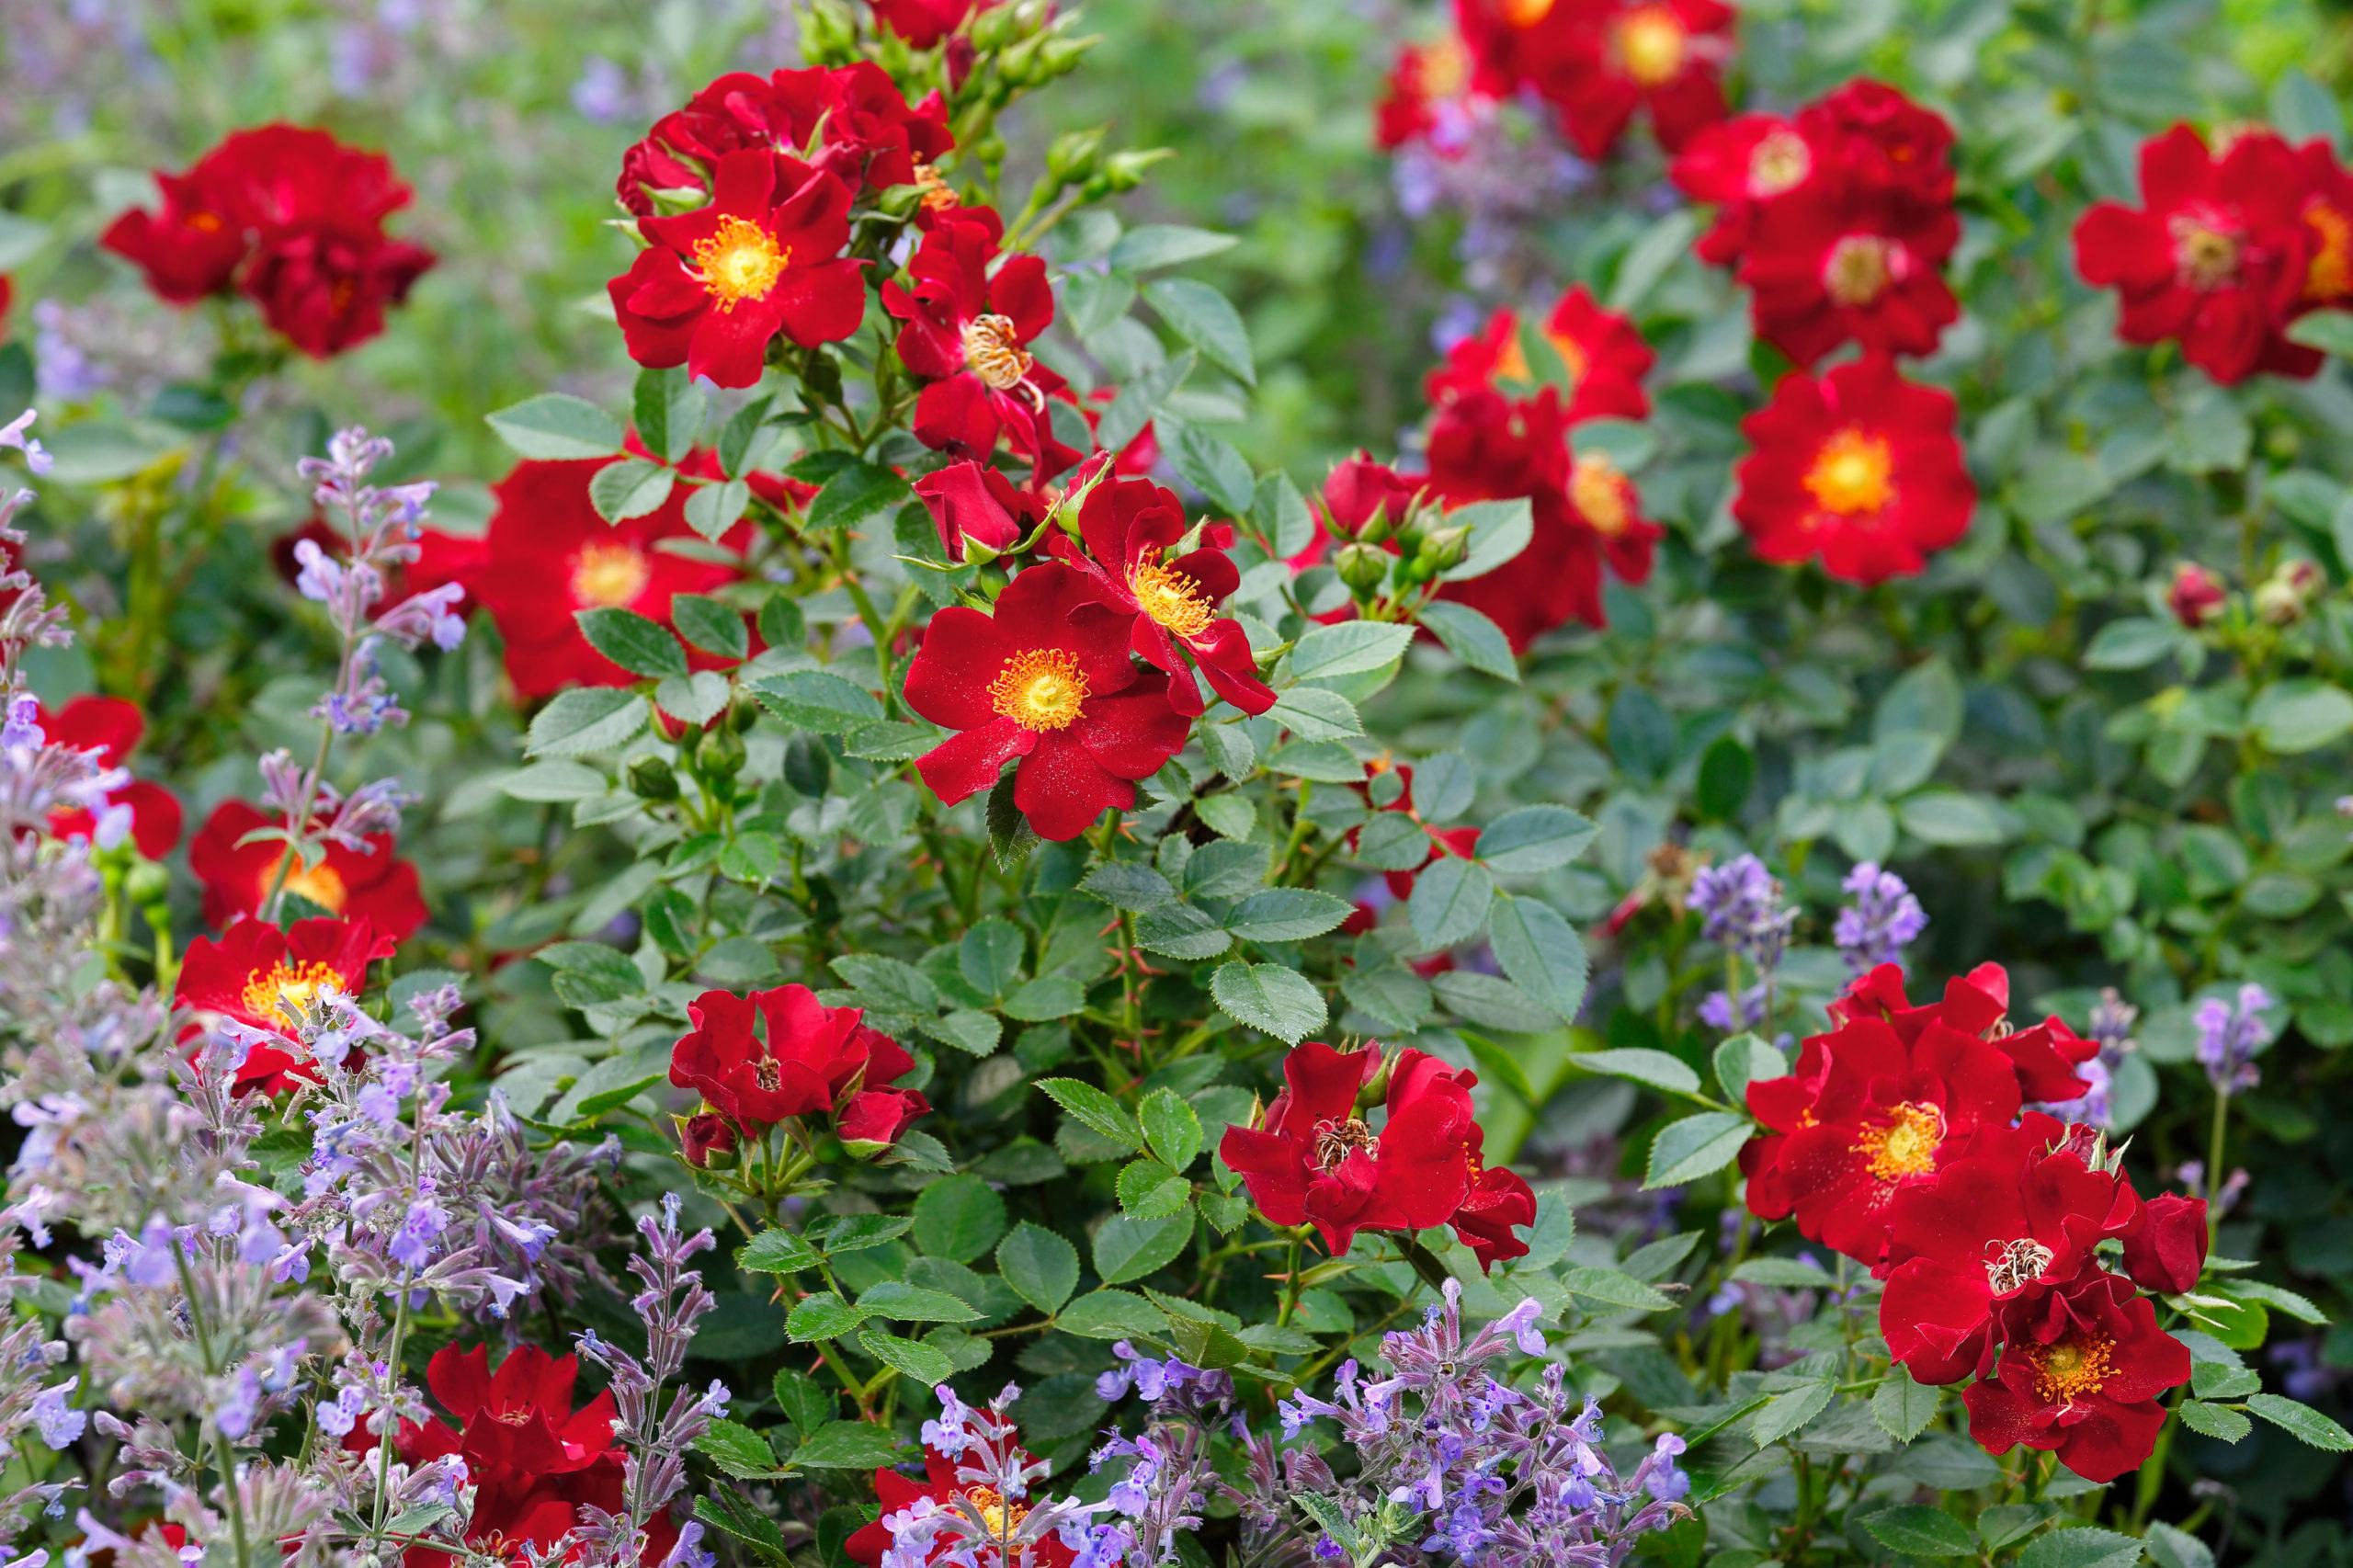 Naturnahe Gärten mit Rosen